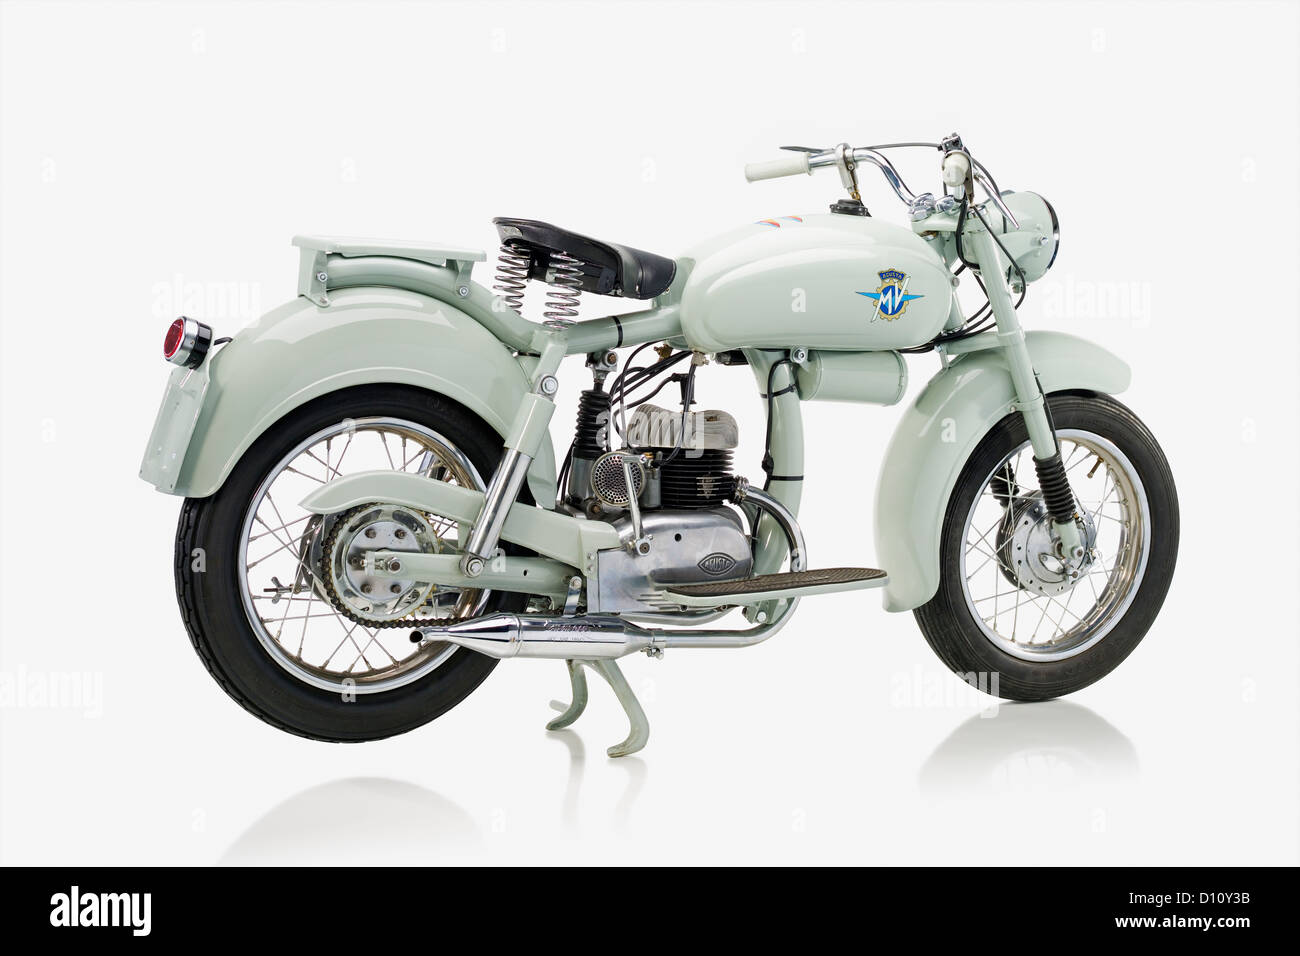 1954 MV Agusta moto Pullman Banque D'Images